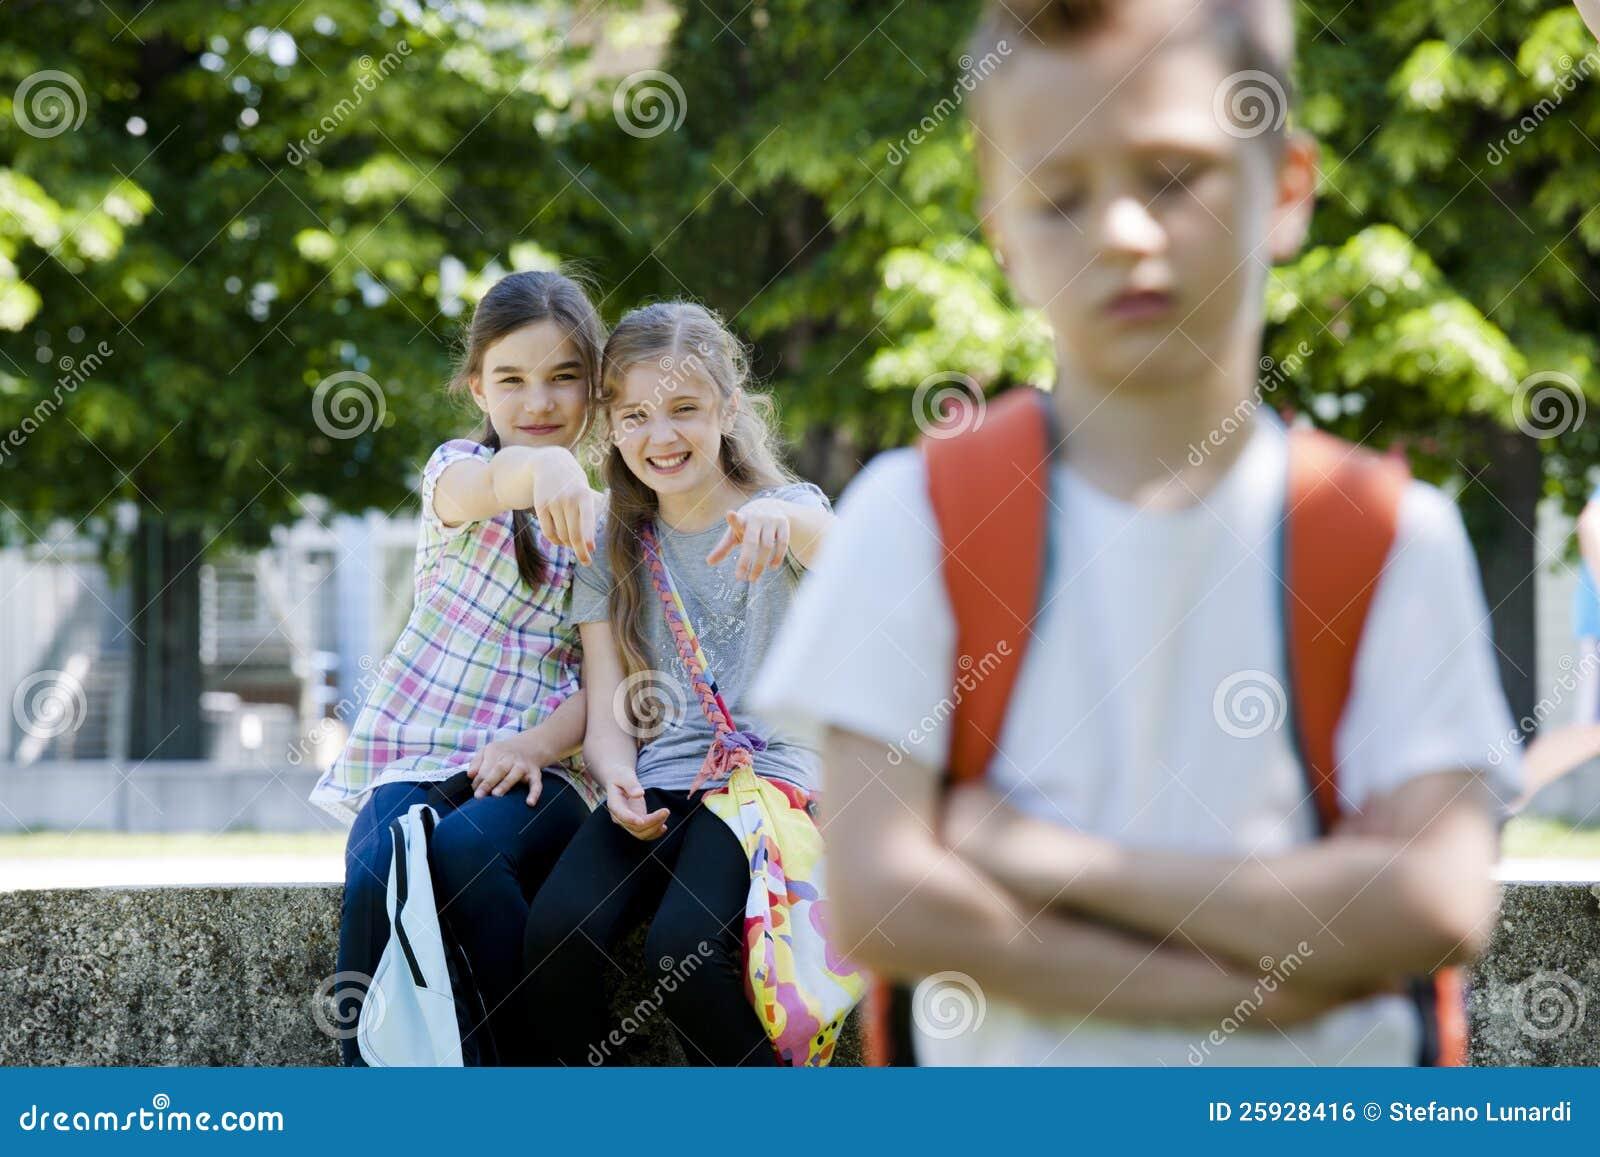 Two Girls Mocking A Boy Royalty Free Stock Image